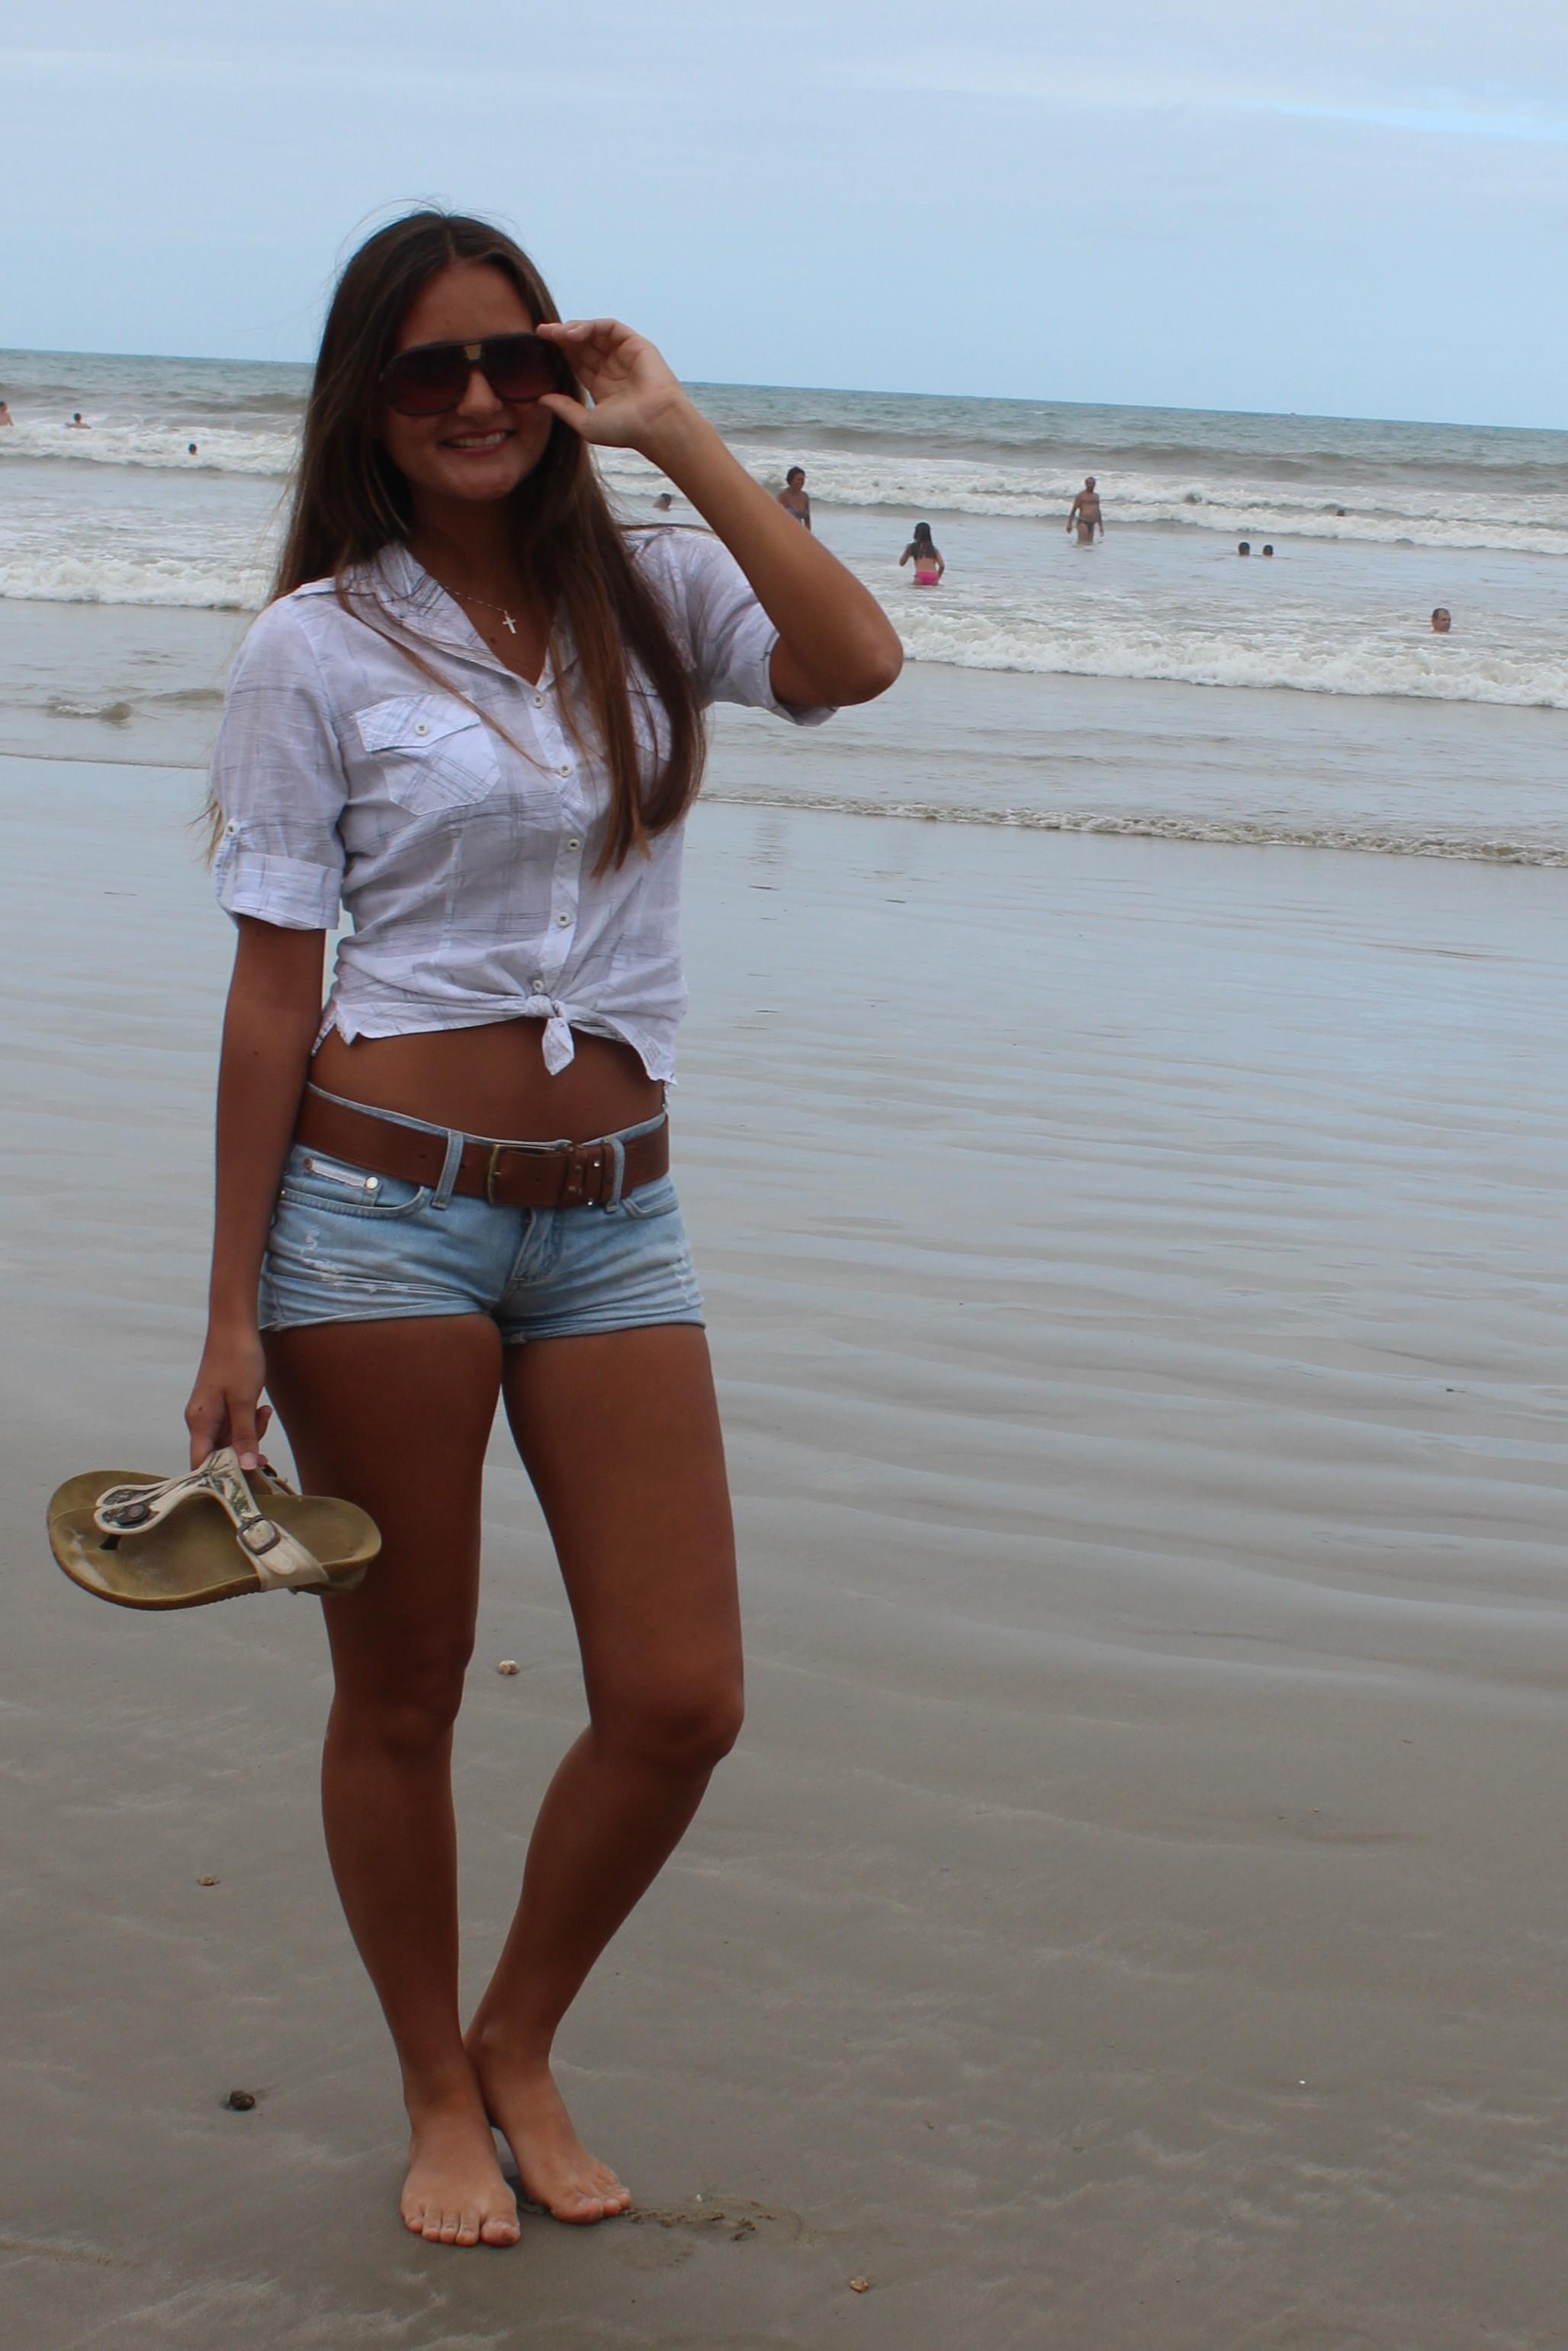 Jovem é de Itapema, no litoral de Santa Catarina (Foto: Géssica Valentini/G1)